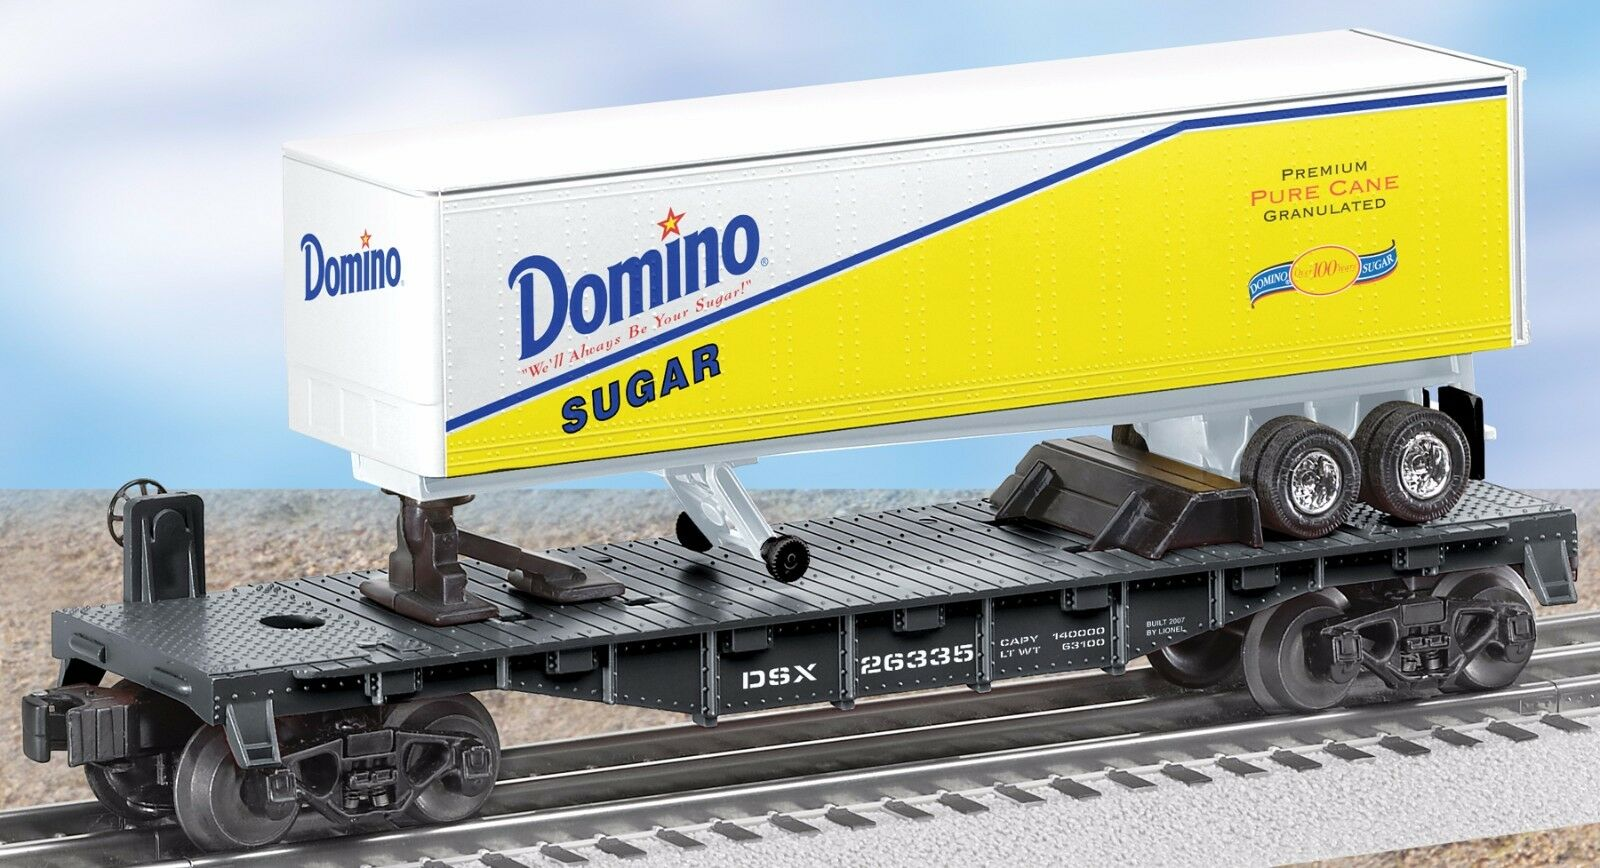 6-26335 Domino Sugar Flatcar w  Trailer